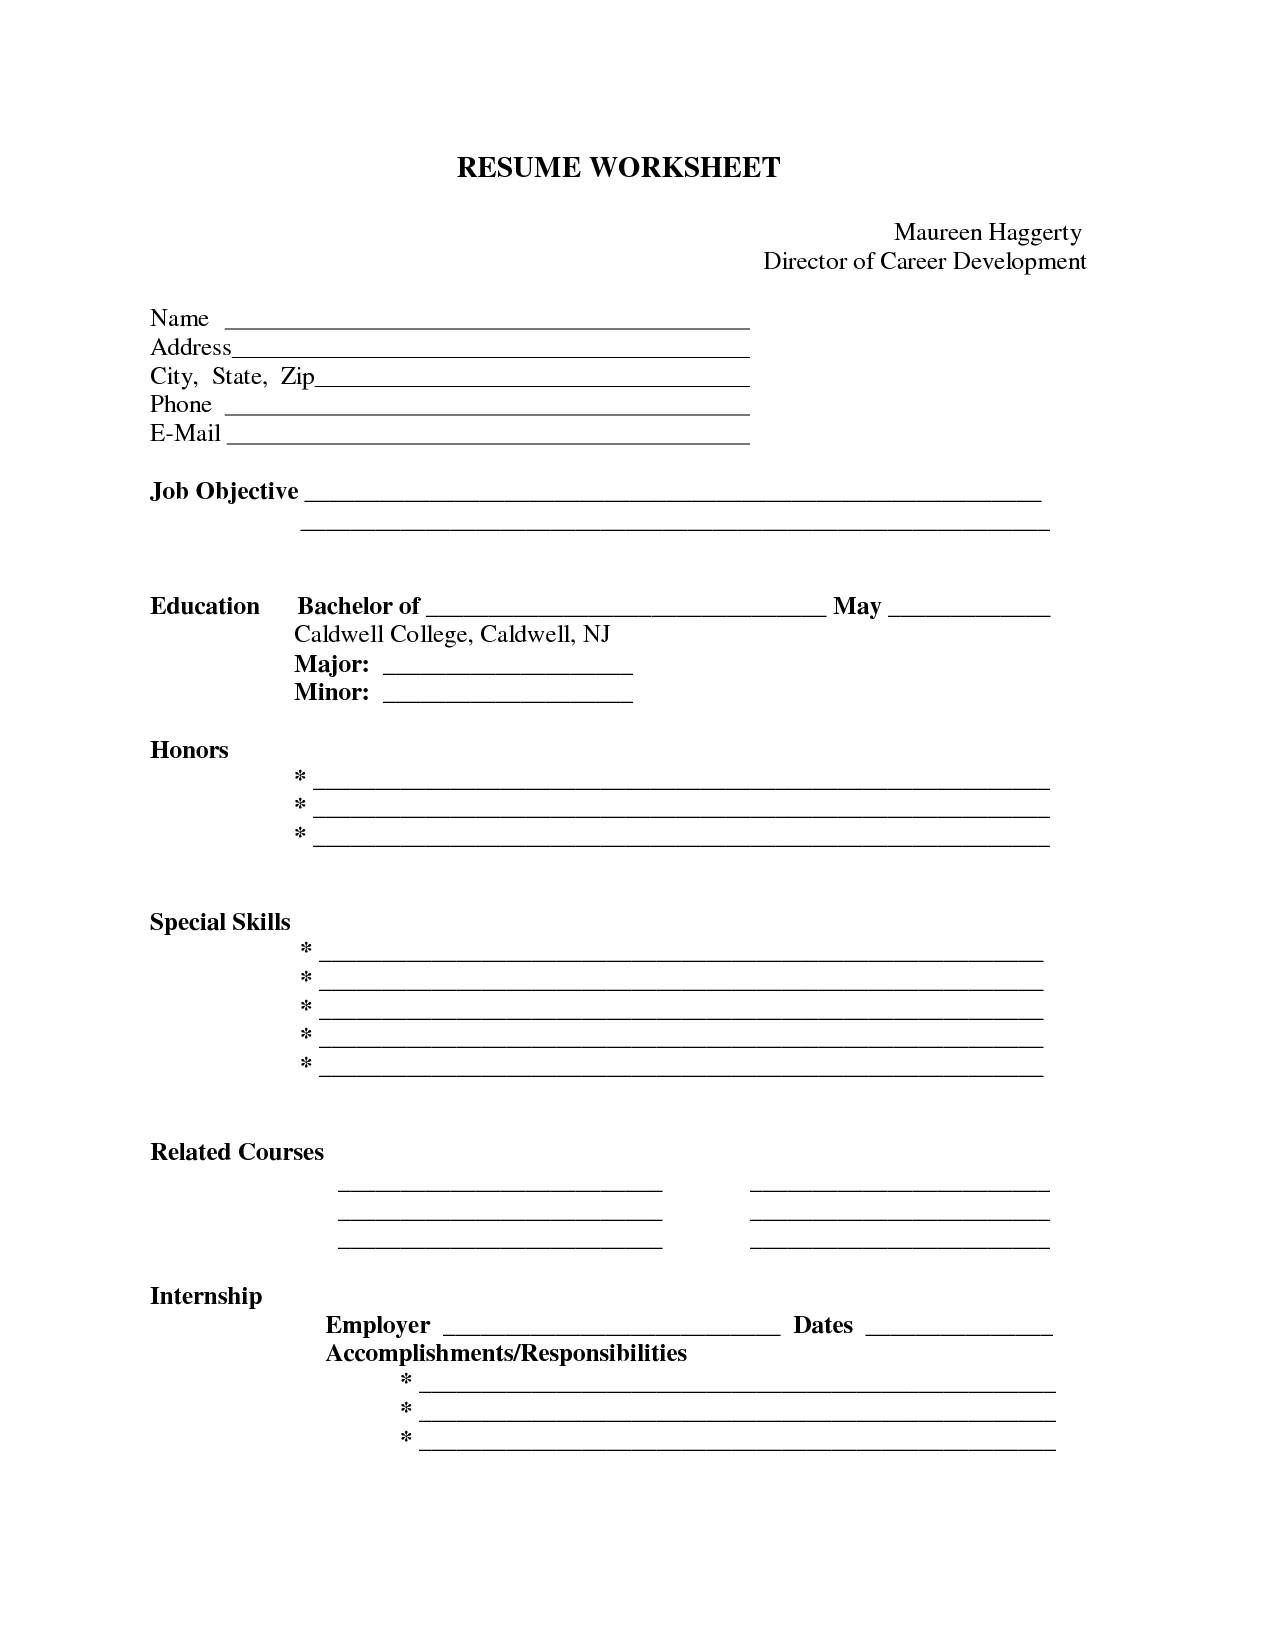 Pin Oleh Jobresume Di Resume Career Termplate Free | Resume Form - Free Blank Resume Forms Printable